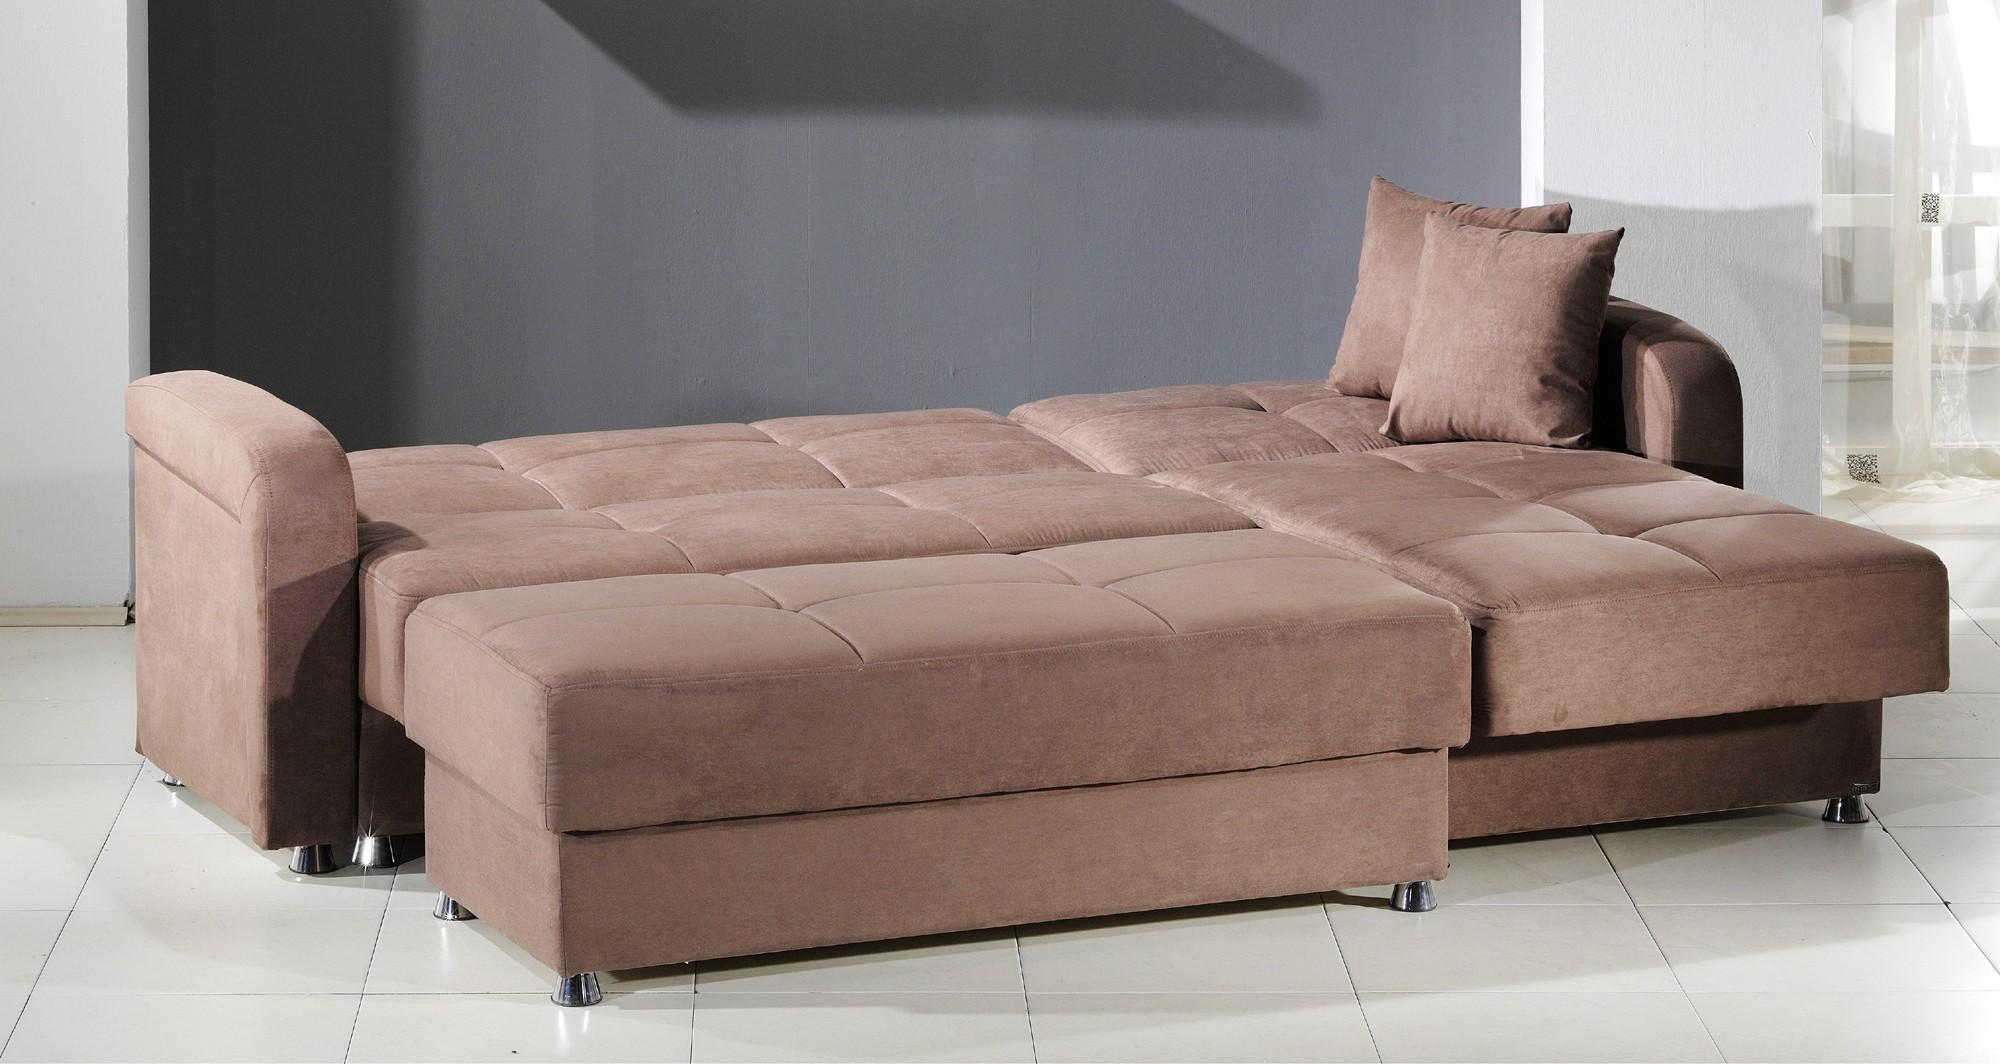 Small Scale Sofa Bed | Tehranmix Decoration Pertaining To Small Scale Sofa Bed (View 8 of 20)